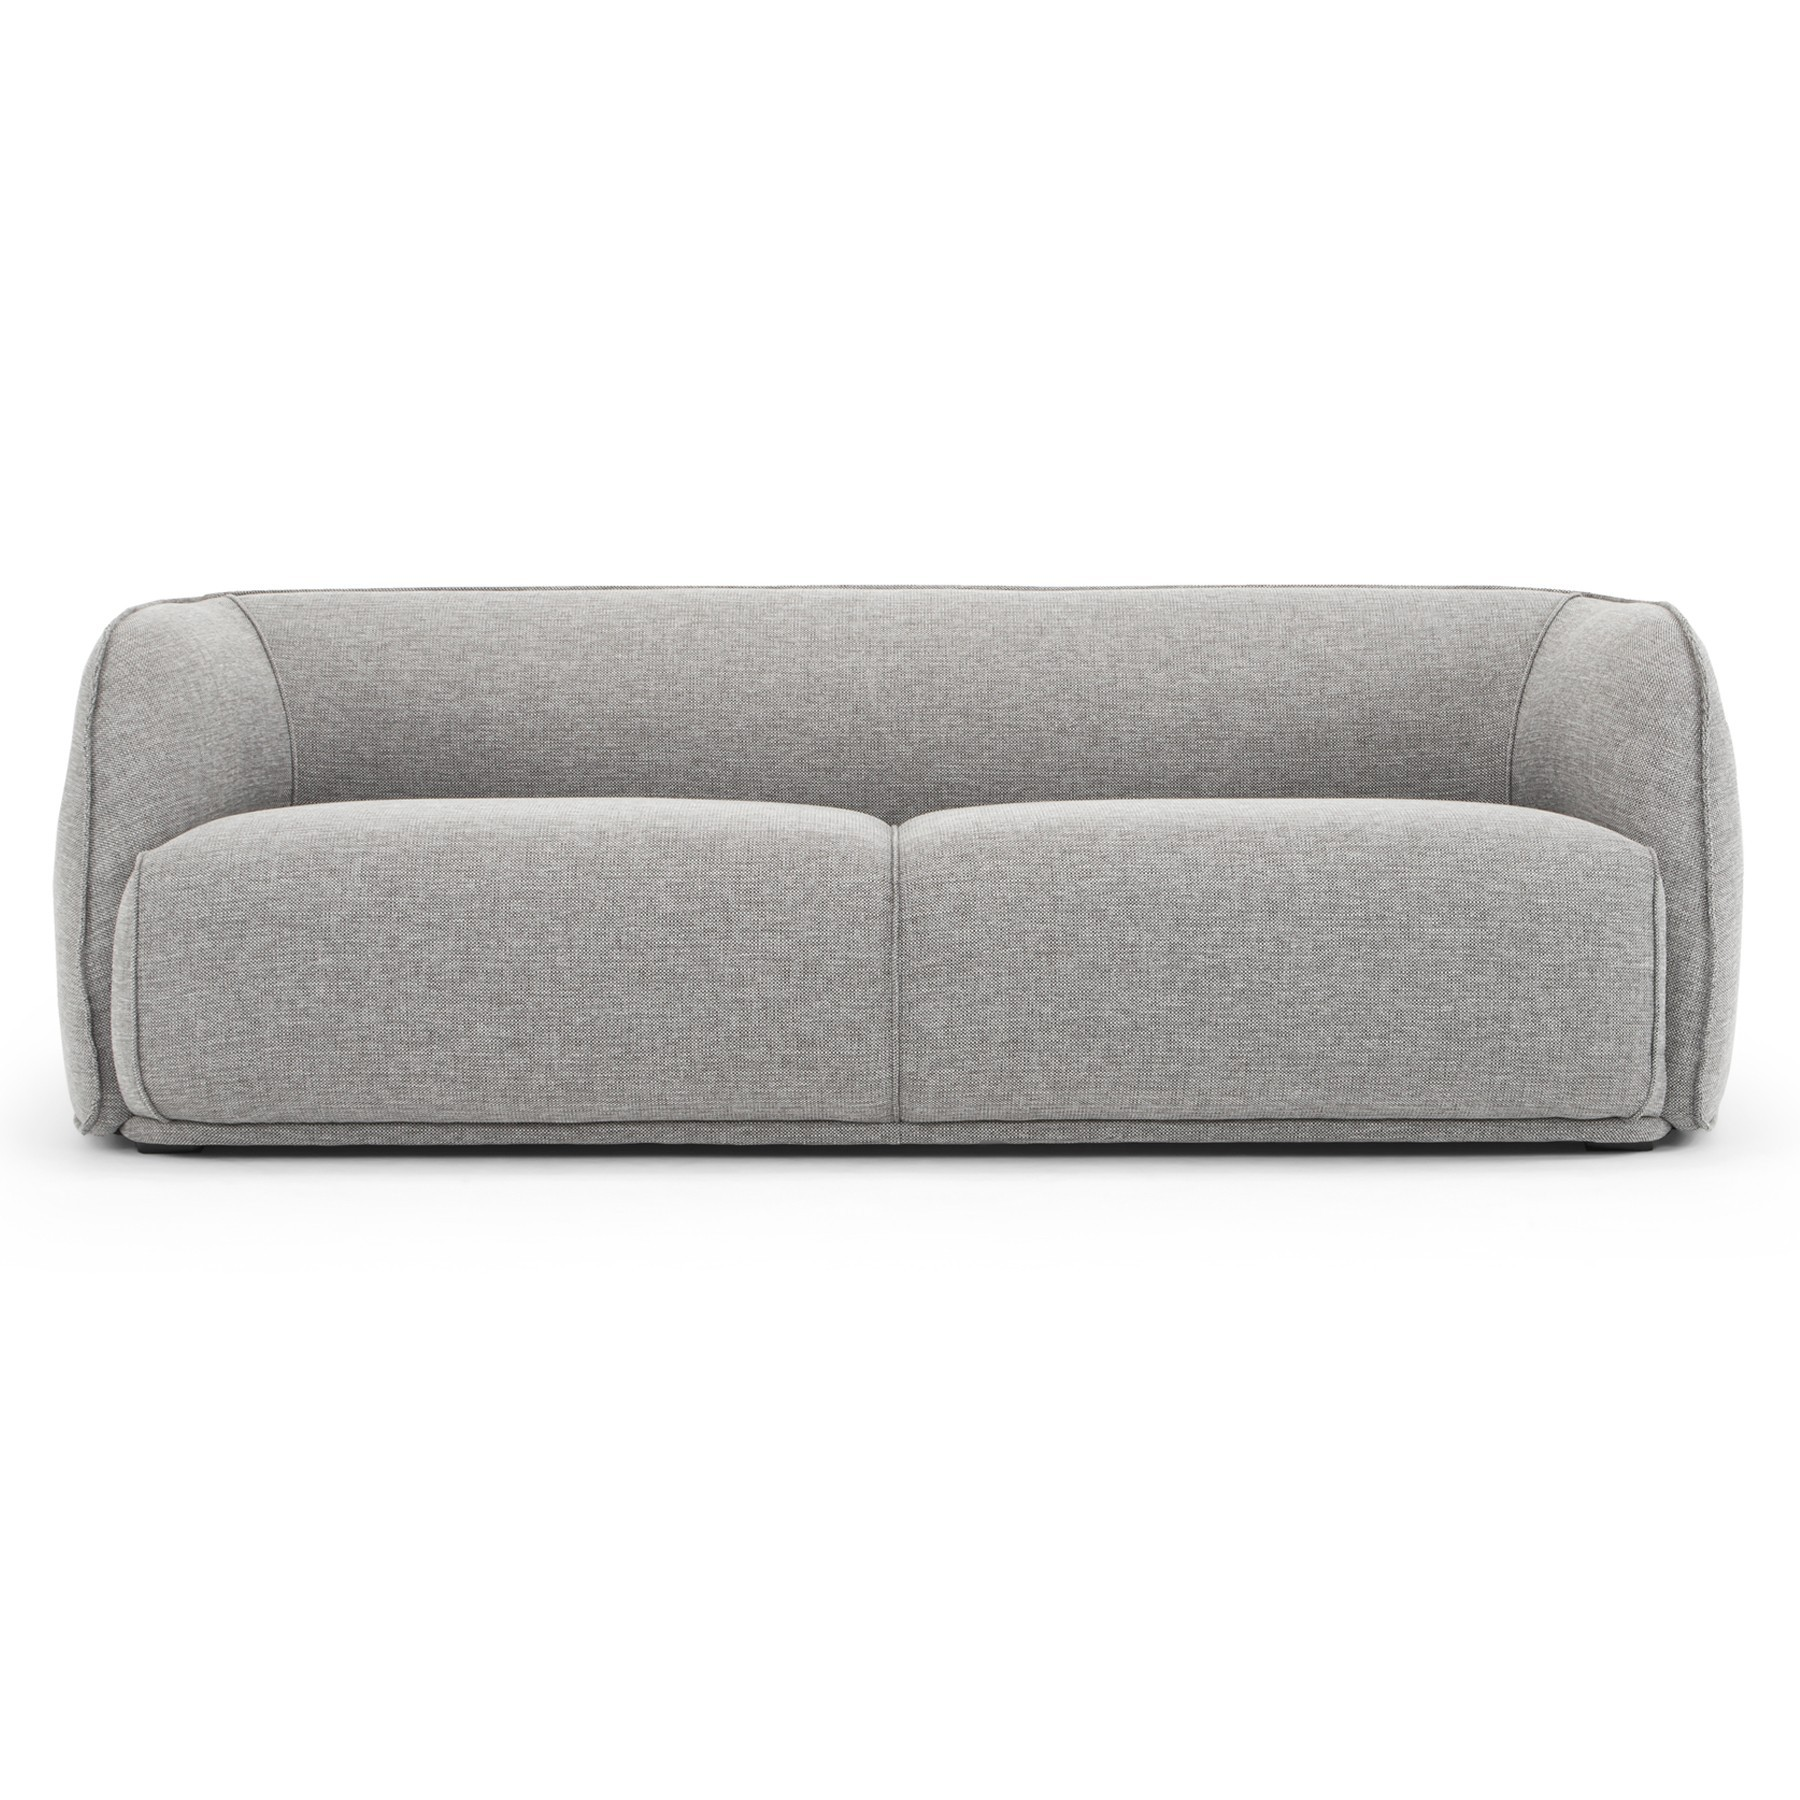 Havero Fabric Sofa, 3 Seater, Grey